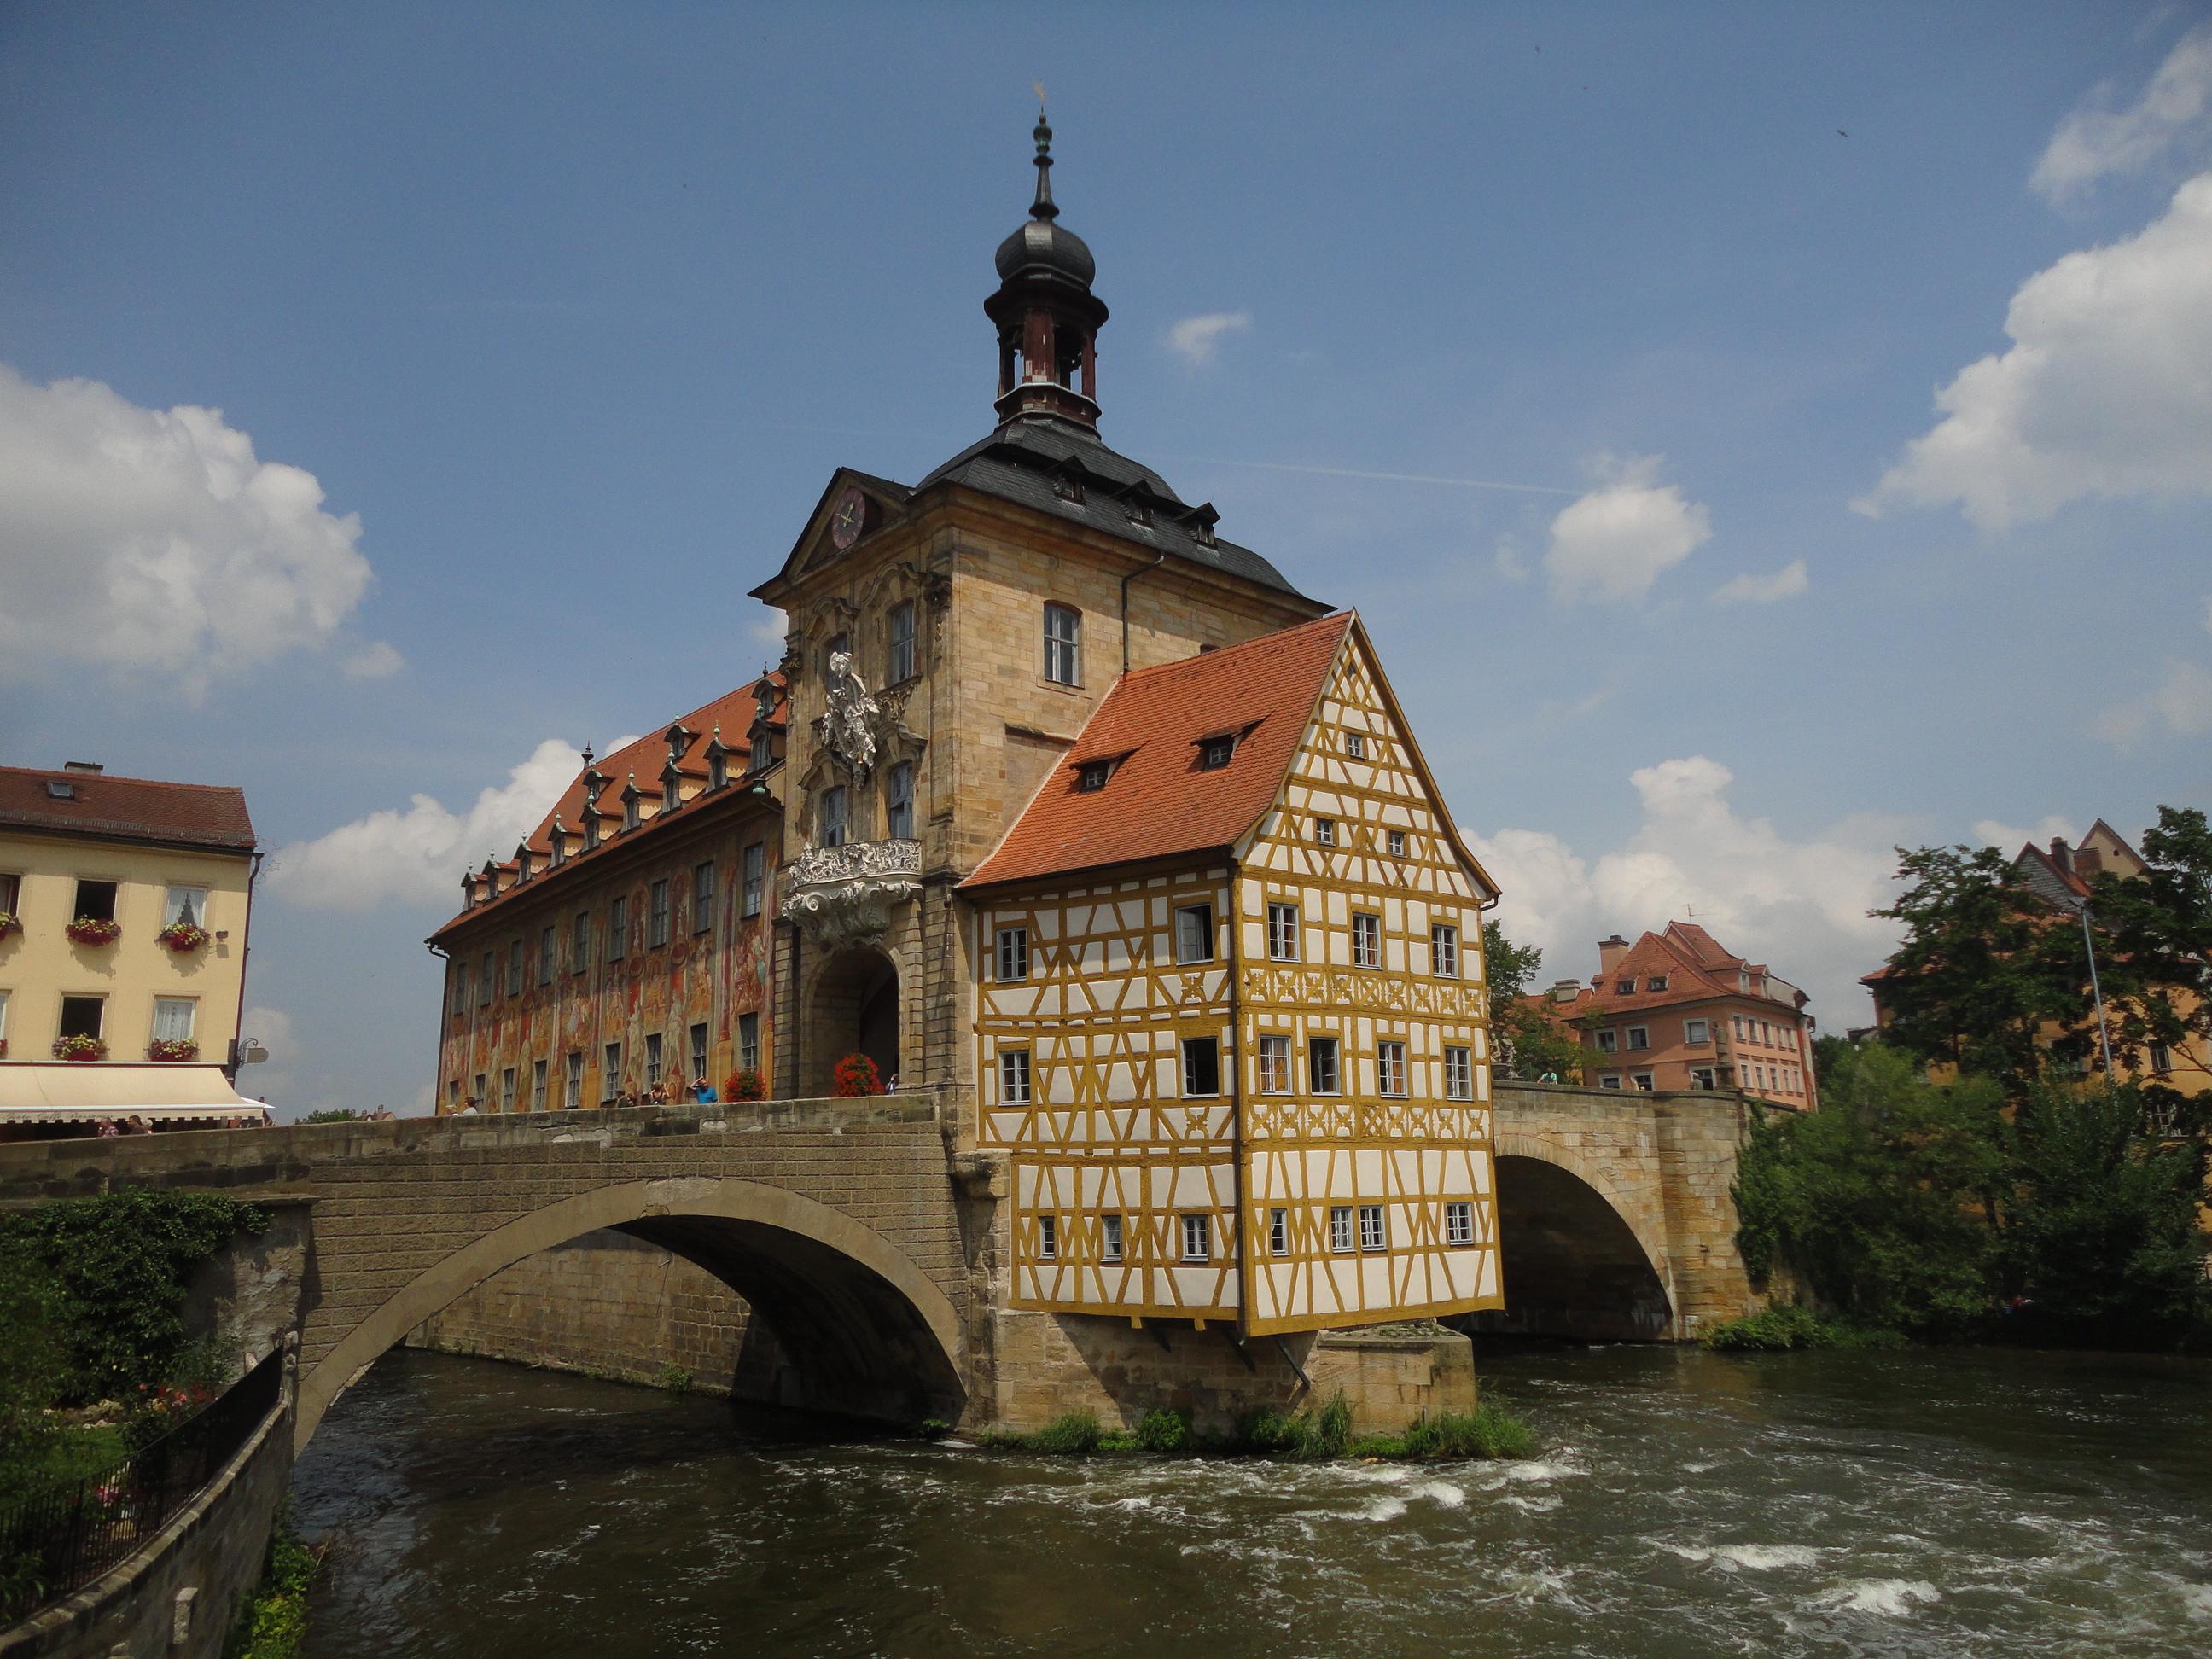 Altesrathaus